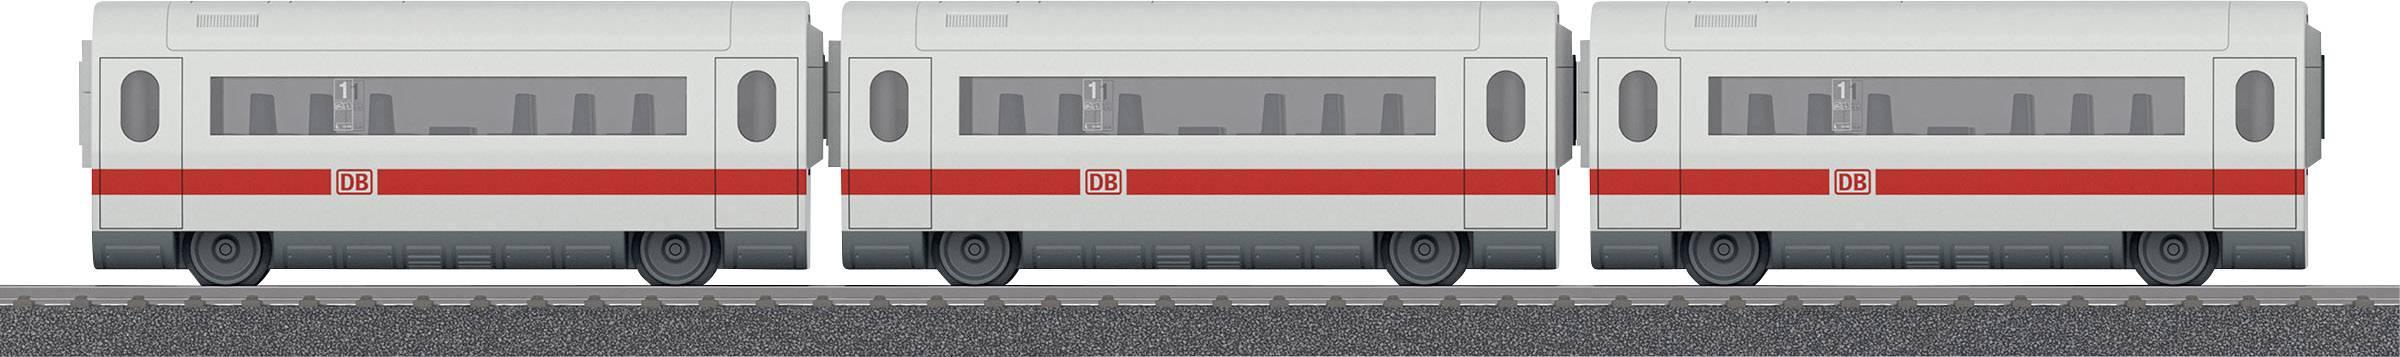 H0 osobní vagon, model Märklin World 44108